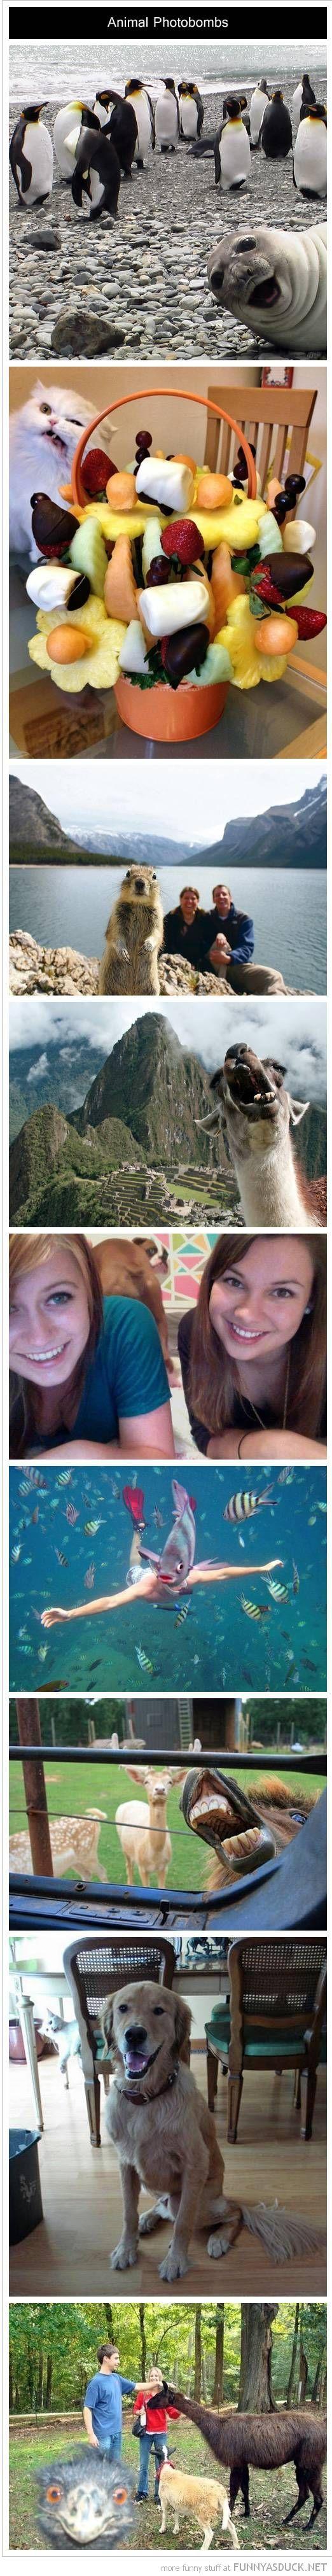 funny-animal-photobomb-compilation-pics.jpg 522×4,047 pixels